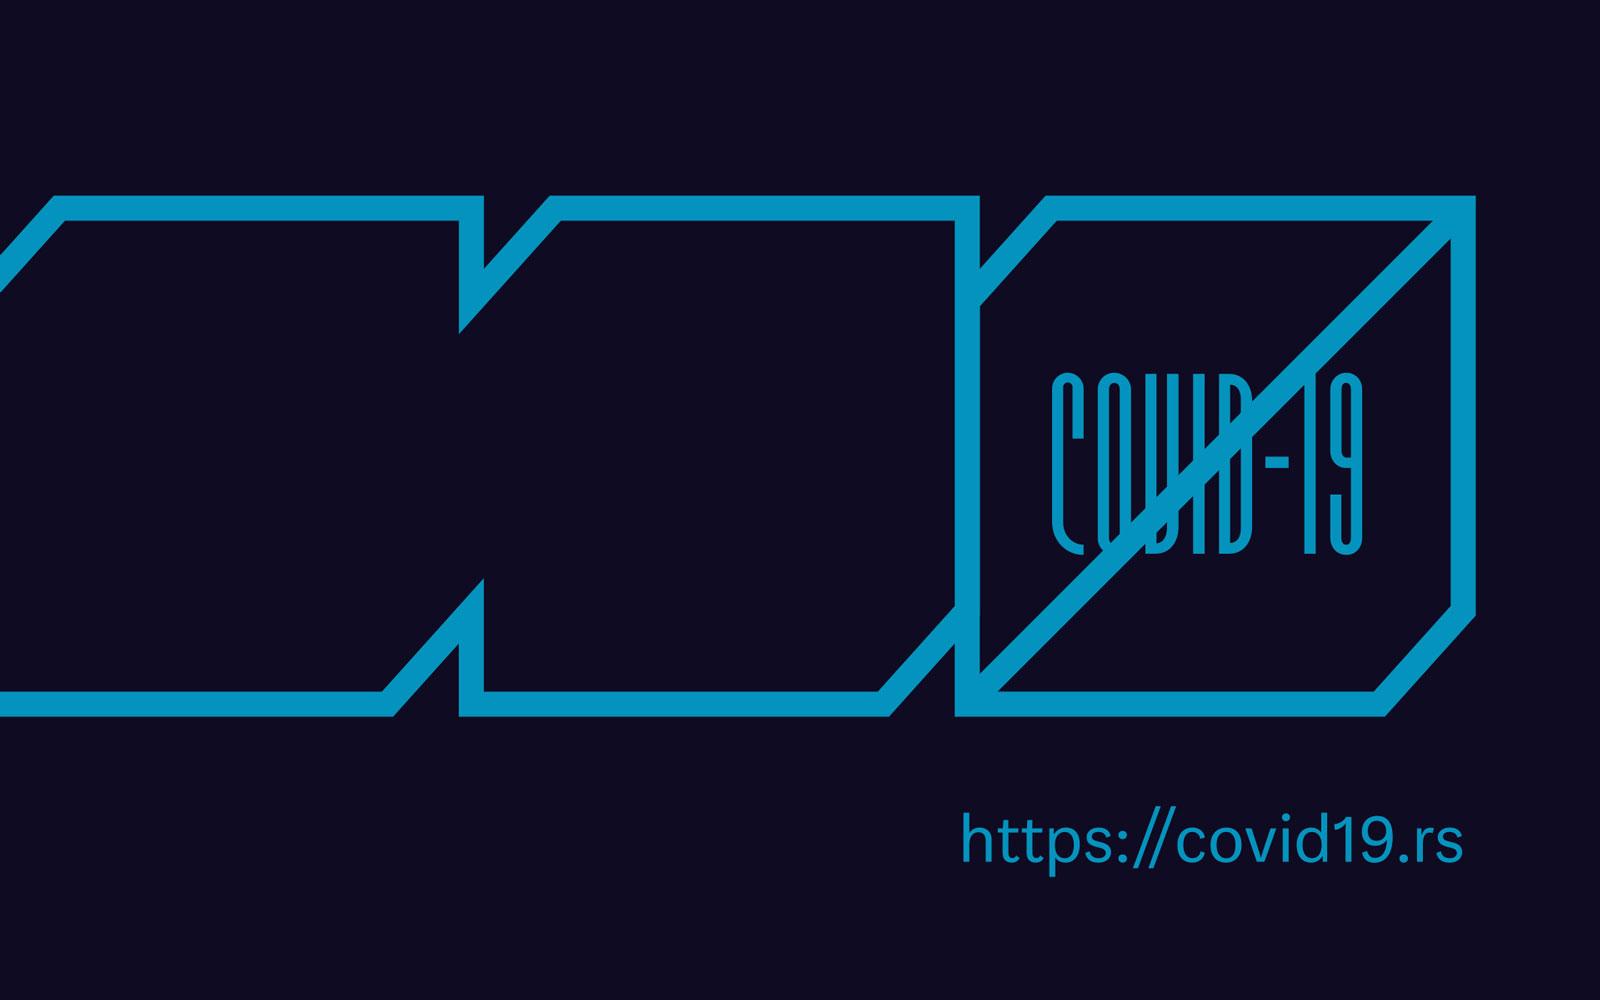 Mere radi sprečavanja pojave, širenja i suzbijanja zarazne bolesti COVID-19